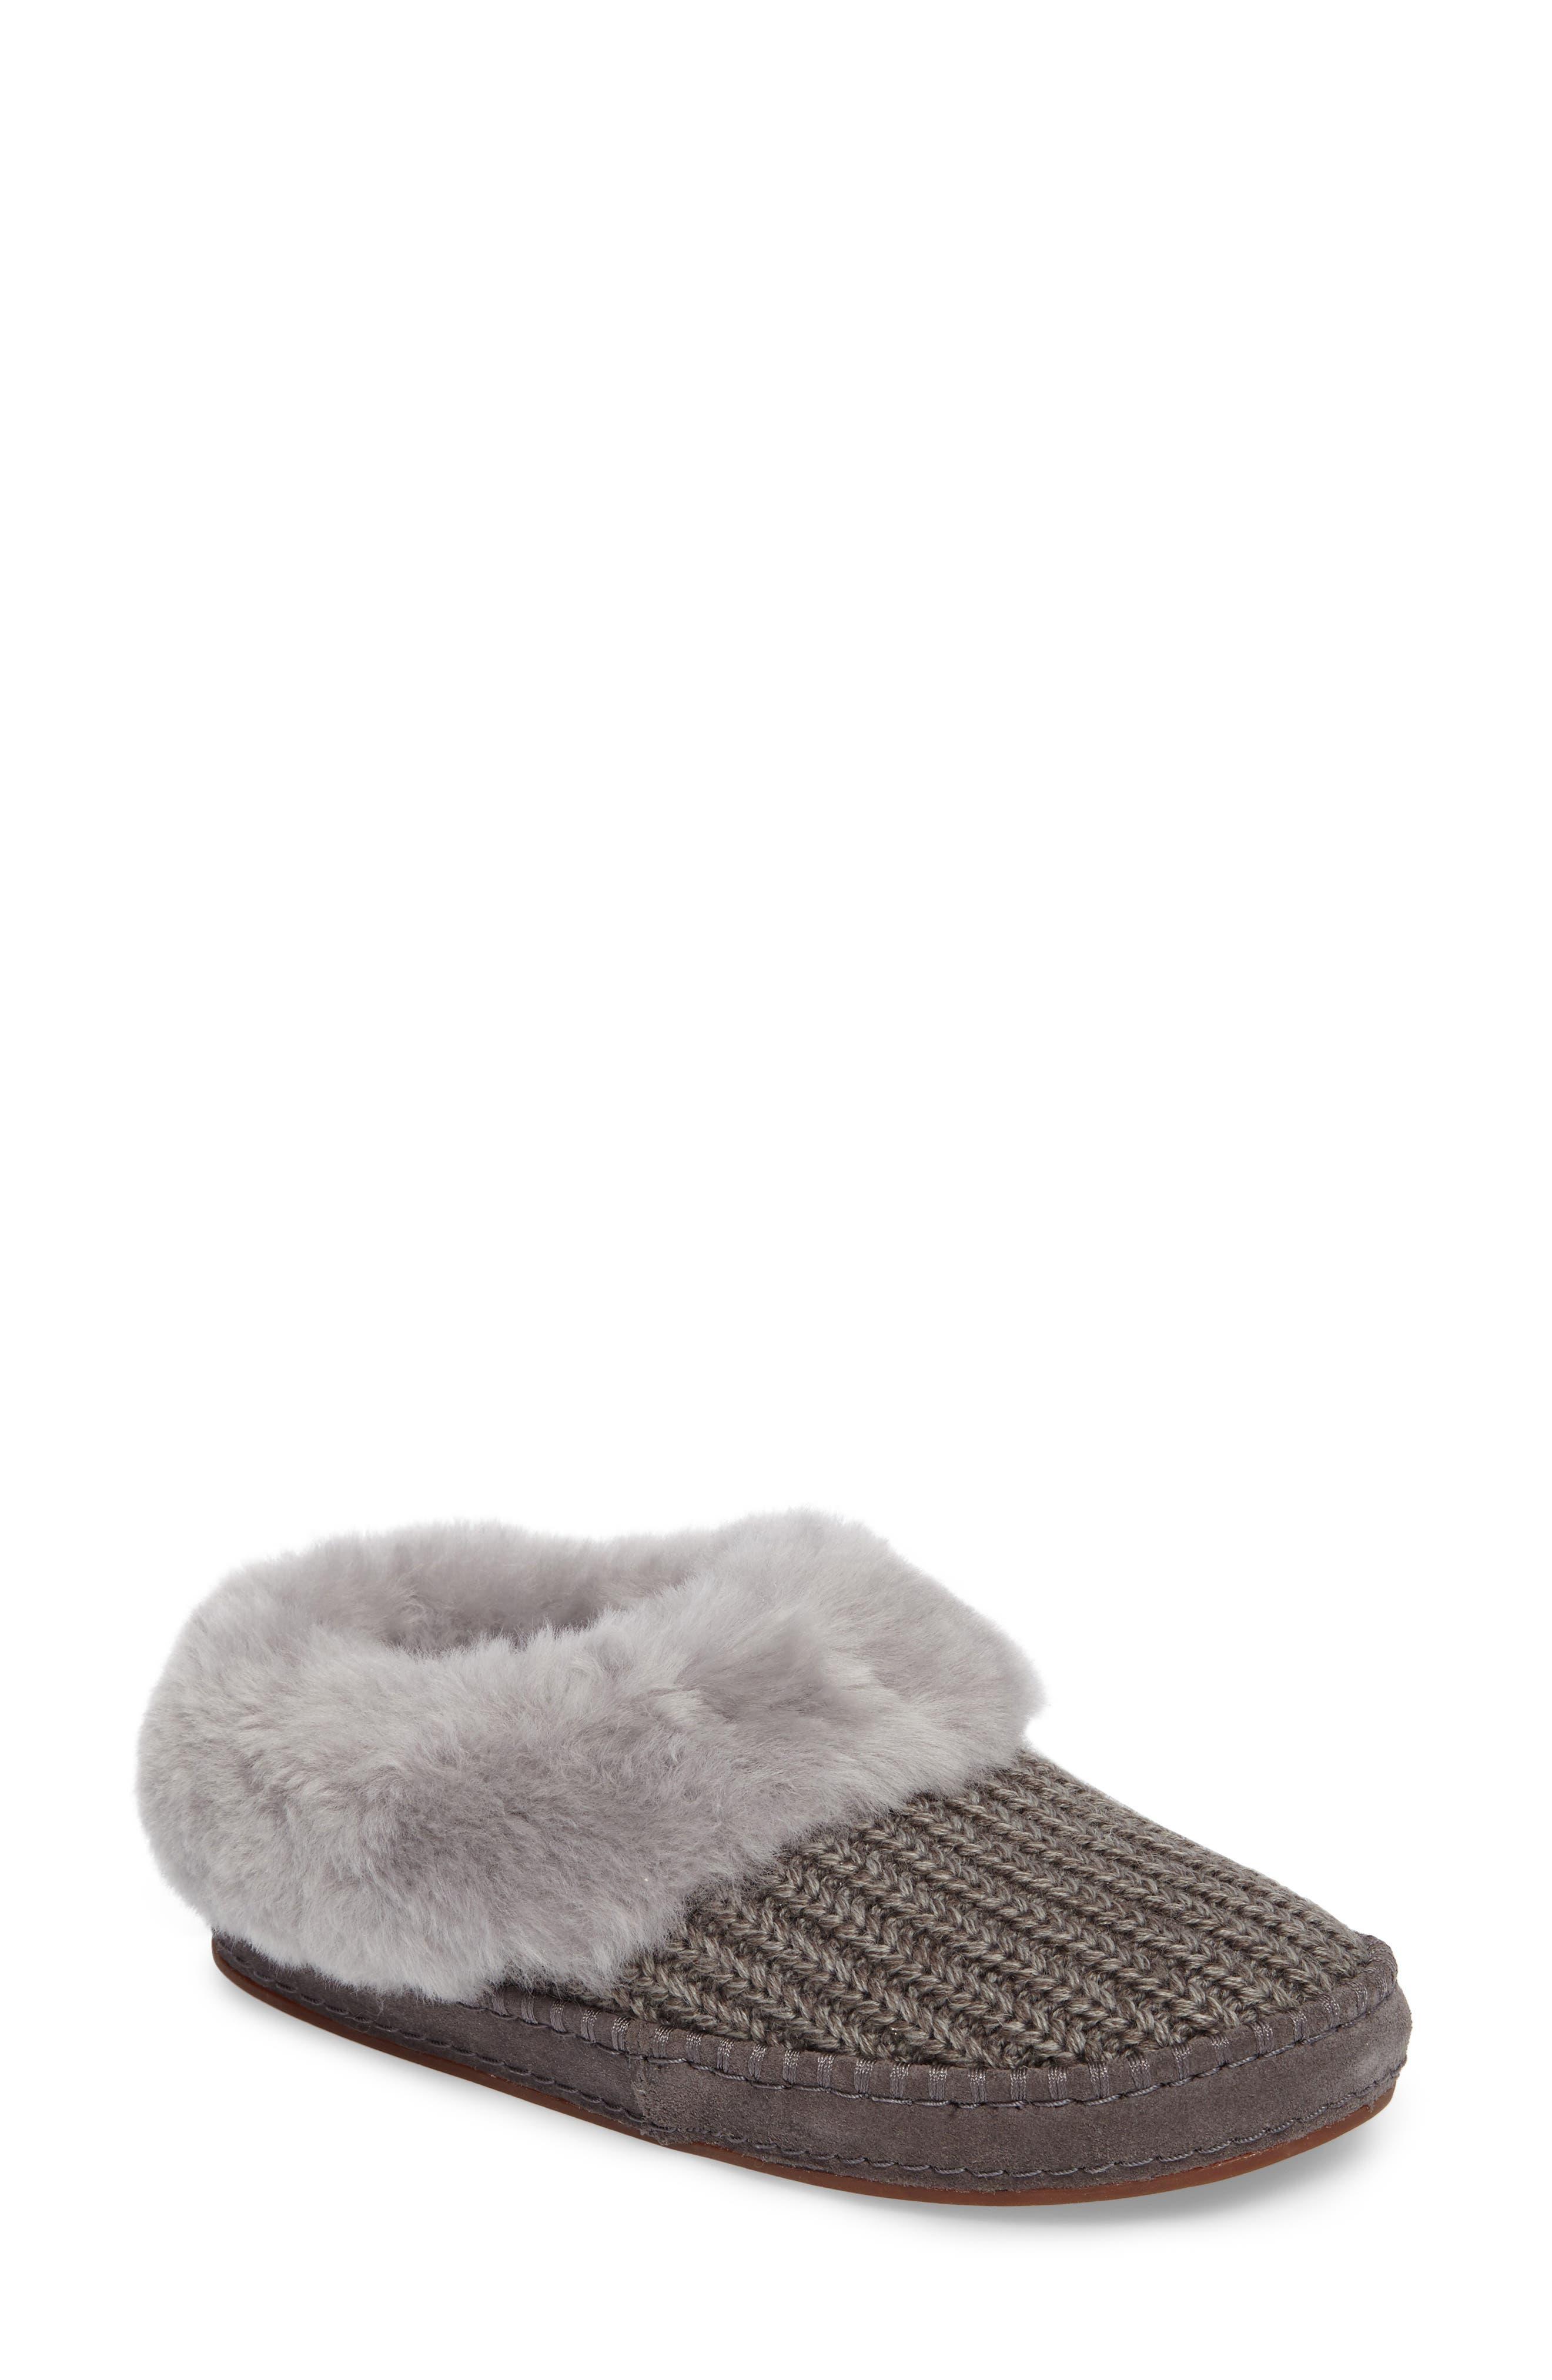 Main Image - UGG® Wrin Rib-Knit & Genuine Shearling Slipper (Women)